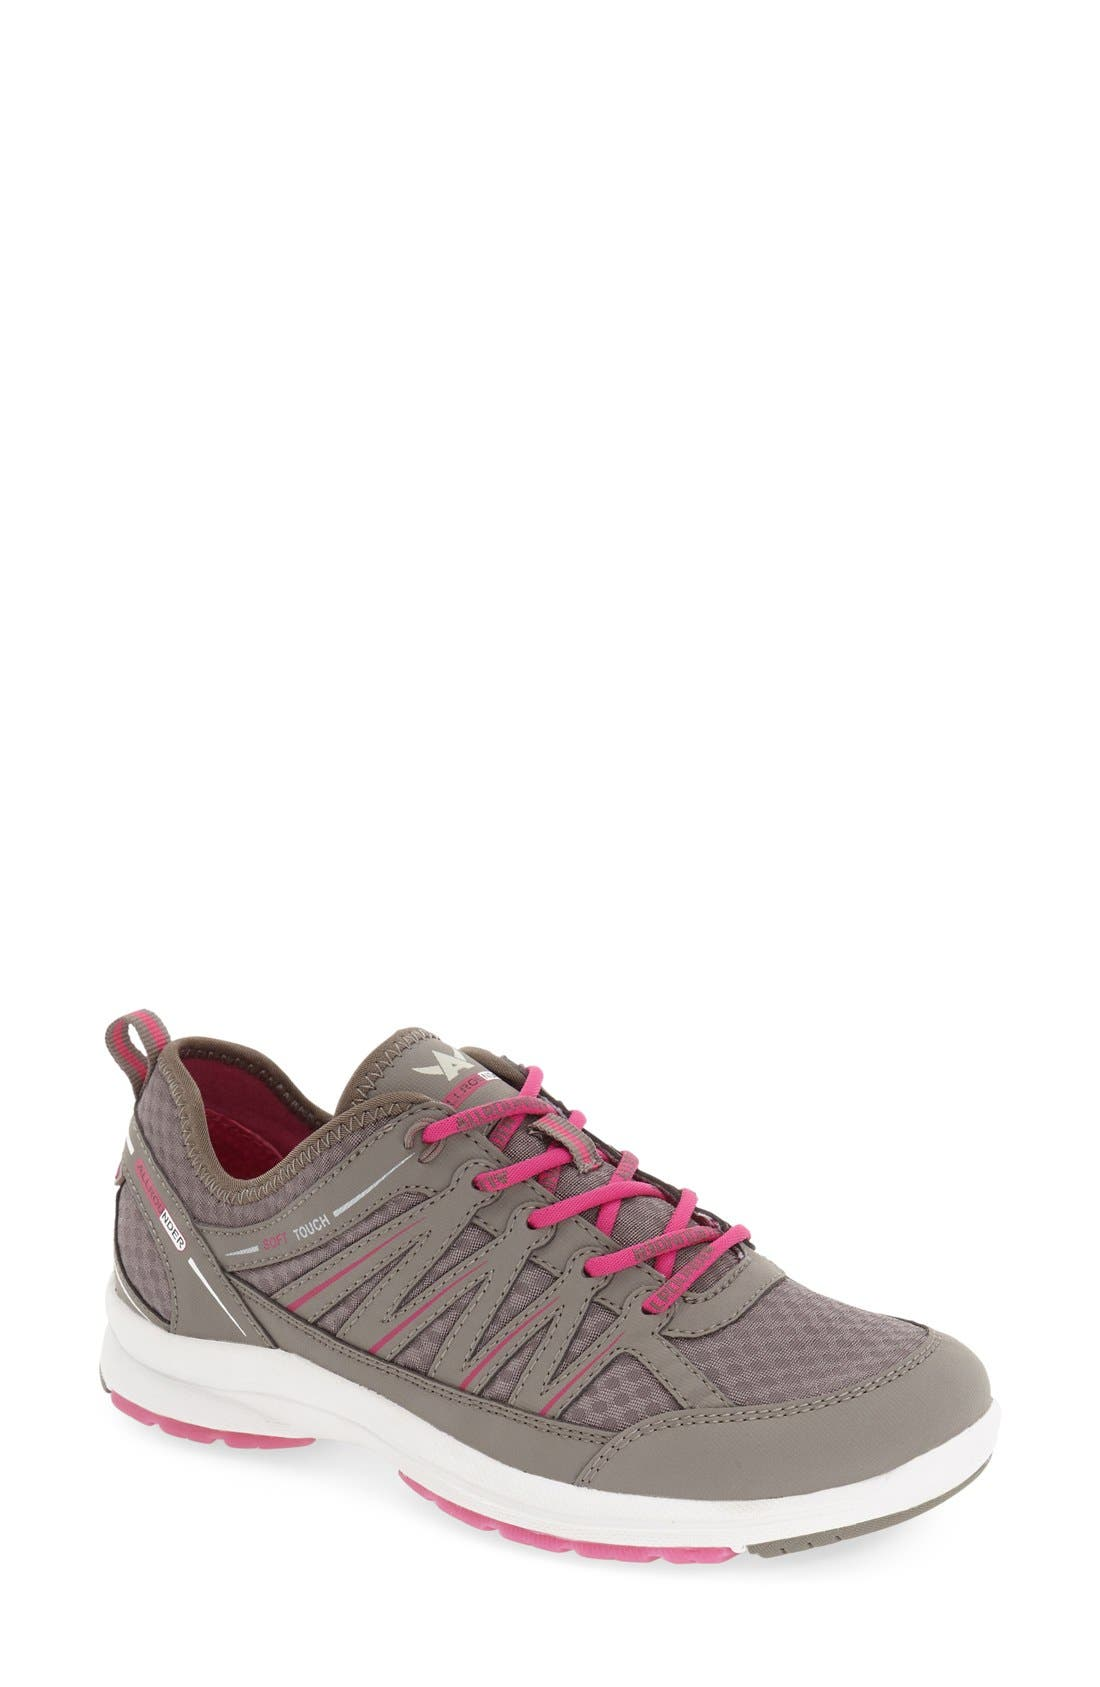 'Darina' Sneaker,                         Main,                         color, Grigio Nubuck Leather